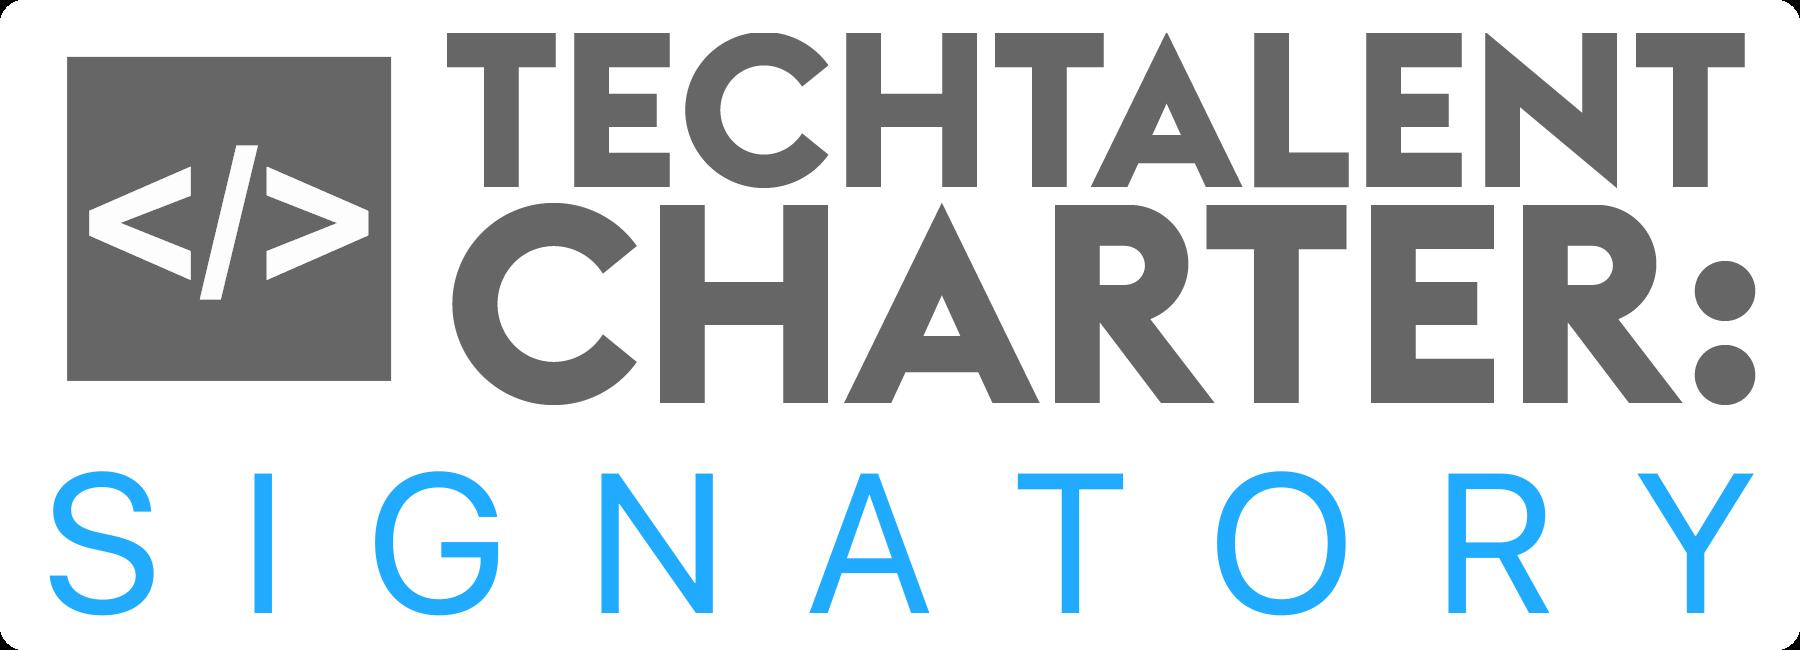 Moonstory is a Tech Talent Charter signatory